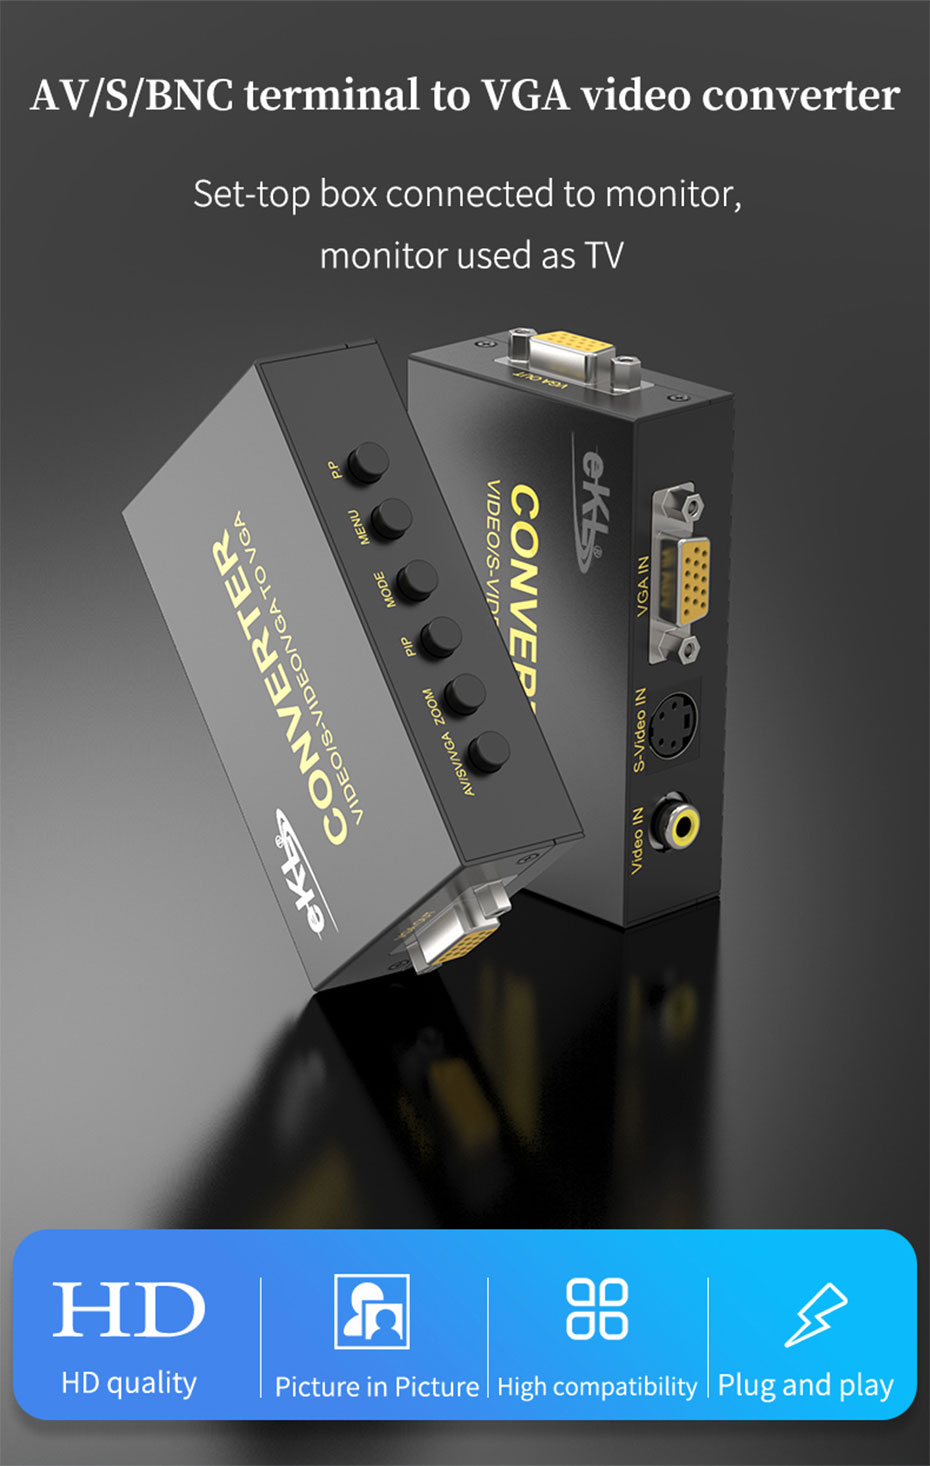 AV/BNC/S-Video to VGA converter 1802